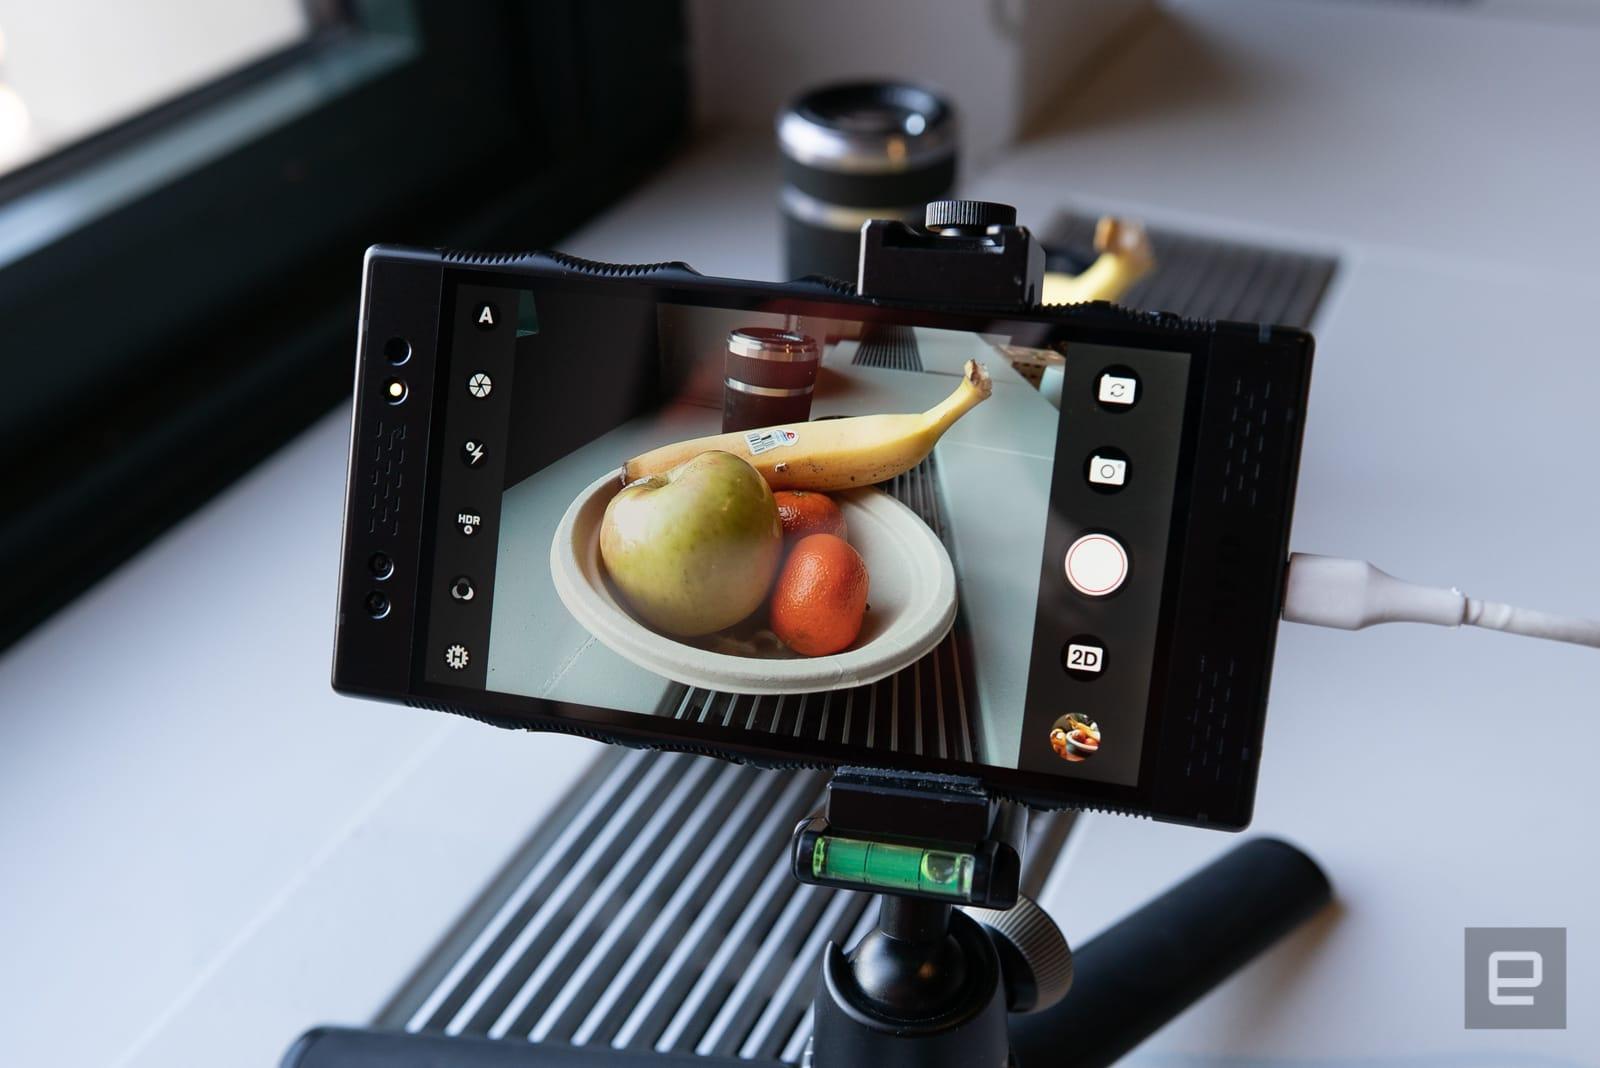 RED Hydrogen Camera System